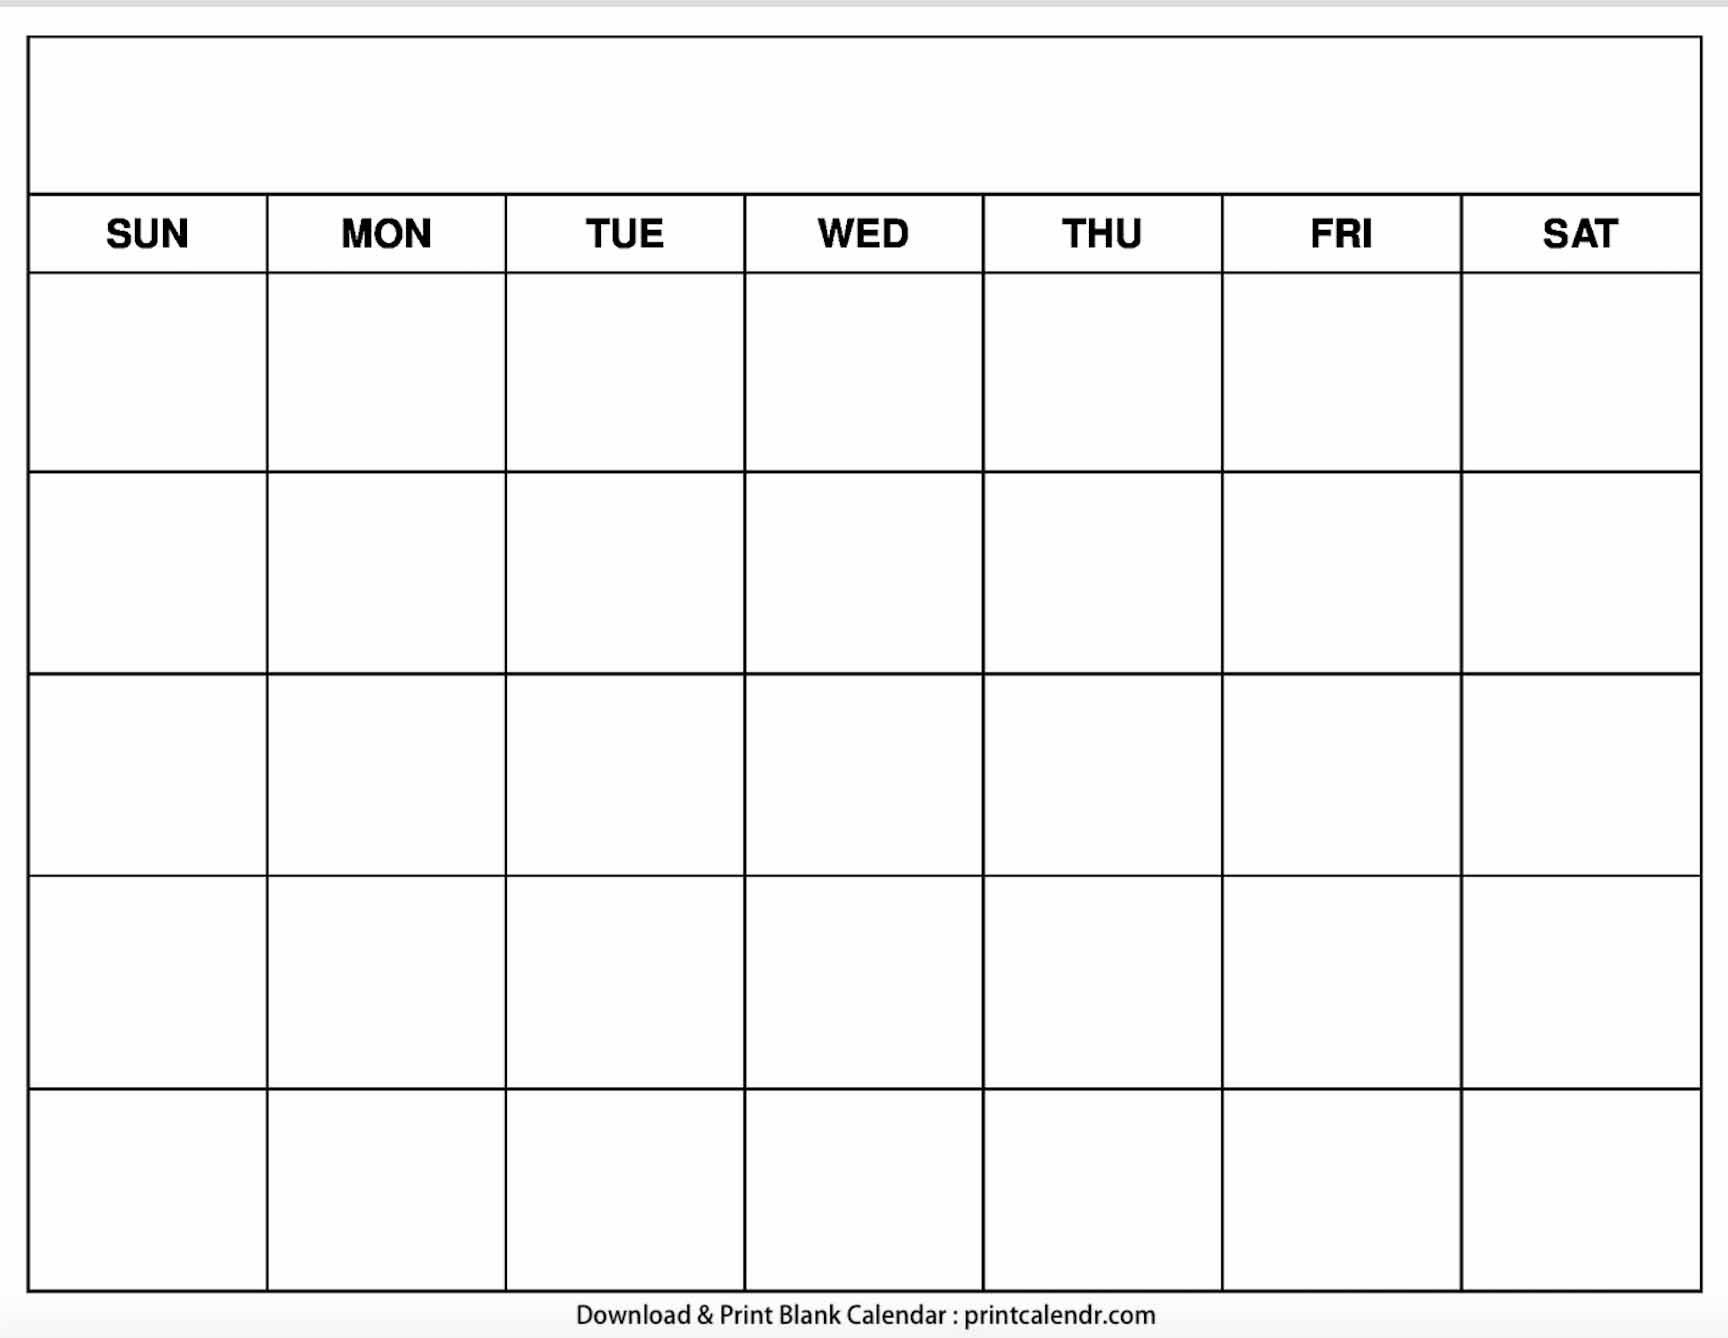 Free Printable Blank Calendars - Print Calendr Blank Calendar I Can Edit And Print